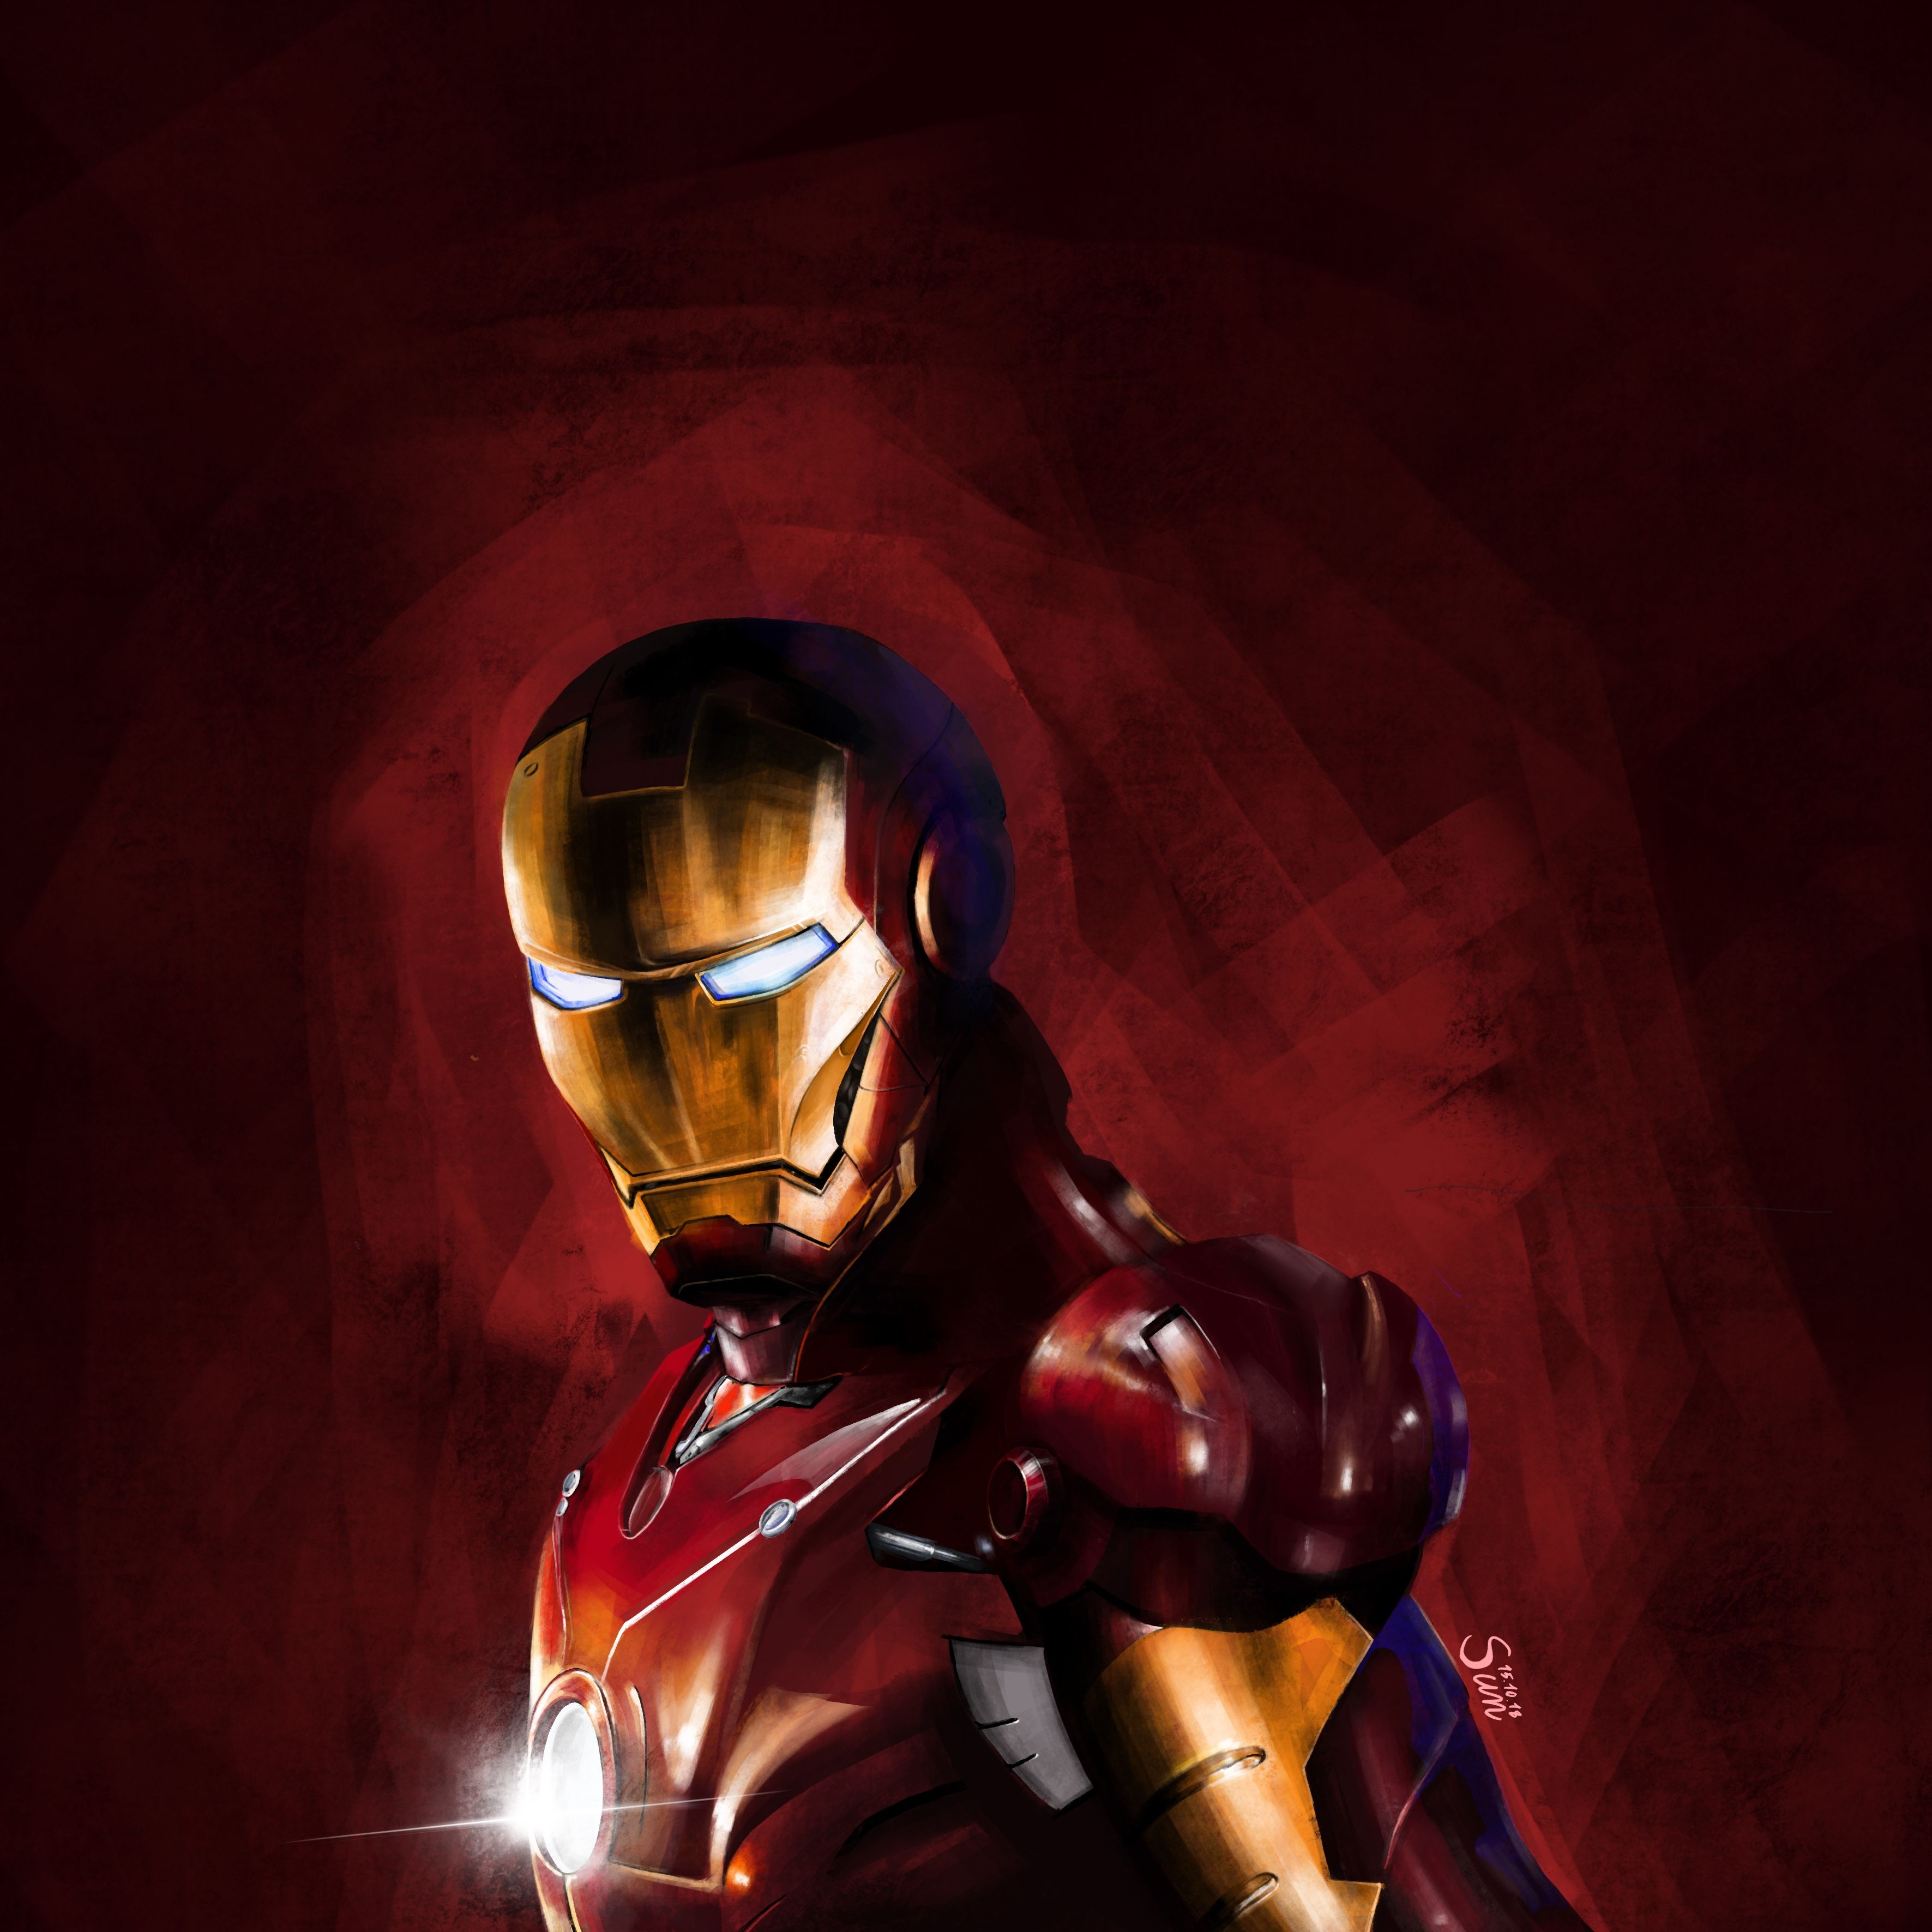 Ironman Digital Drawing Digital Painting Ipad Pro Apple Pencil Iron Man Digital Drawing Colorful Paintings